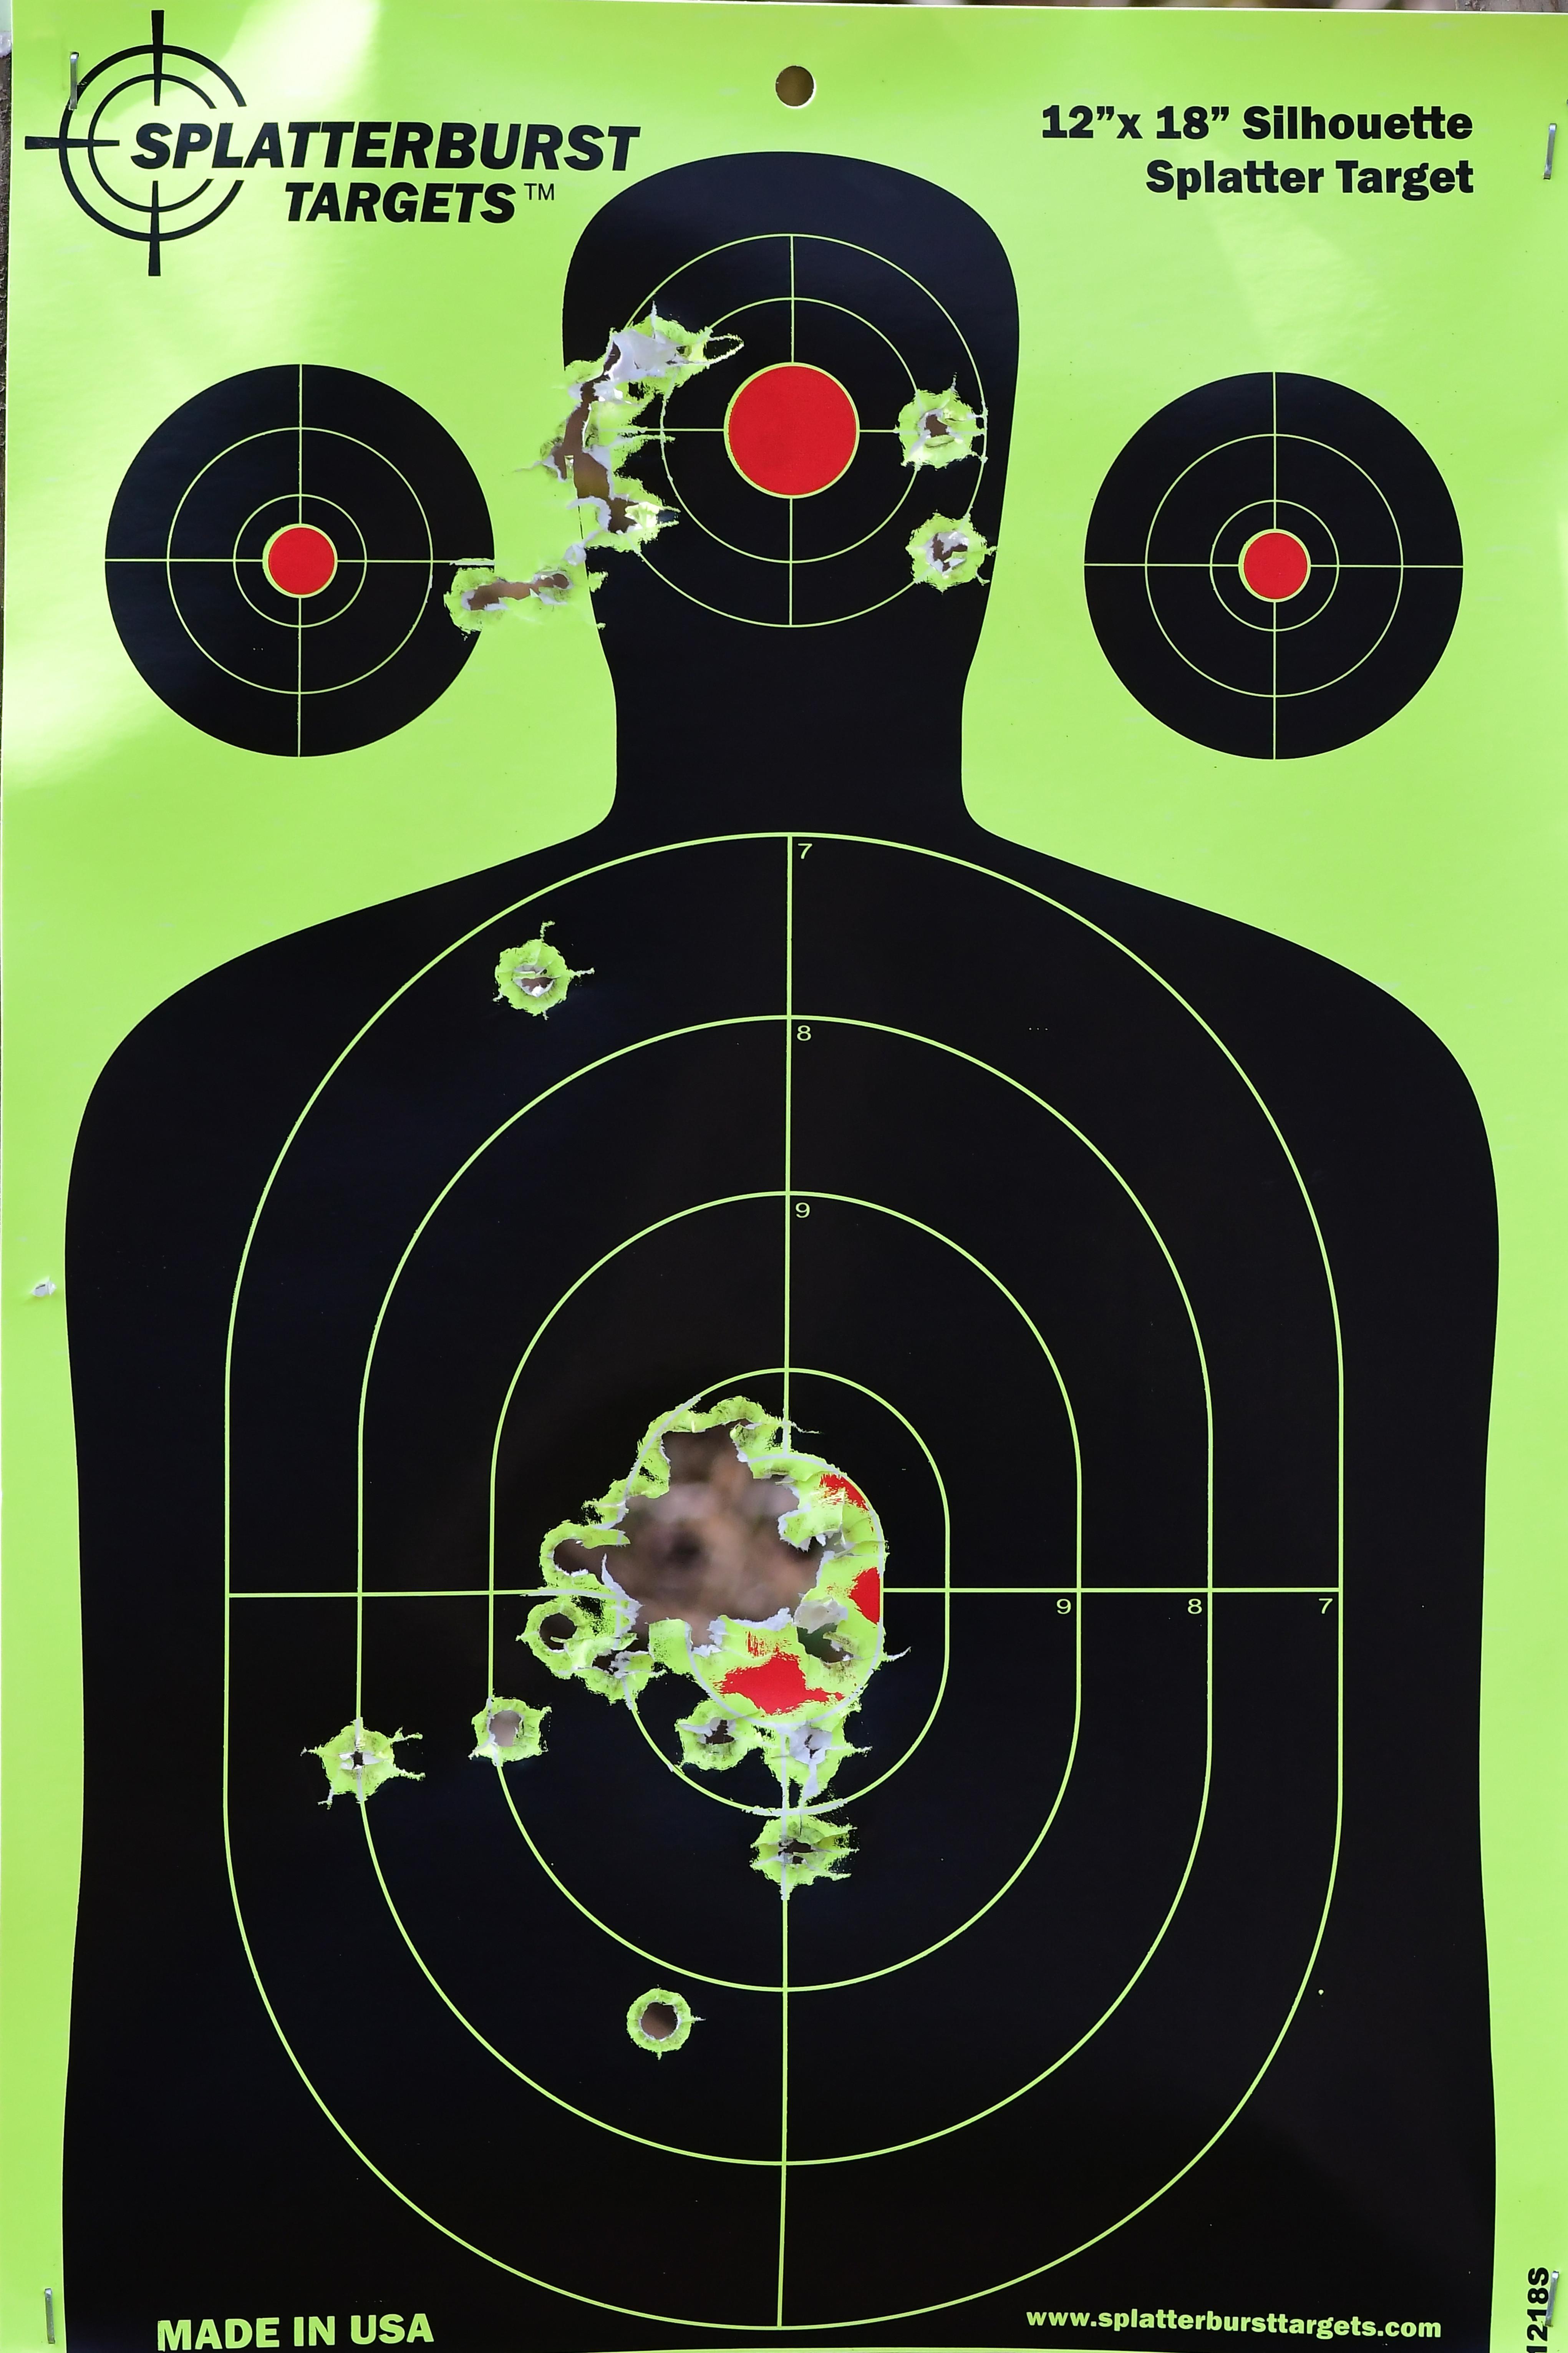 Basic Pistol Shooting (Couples)